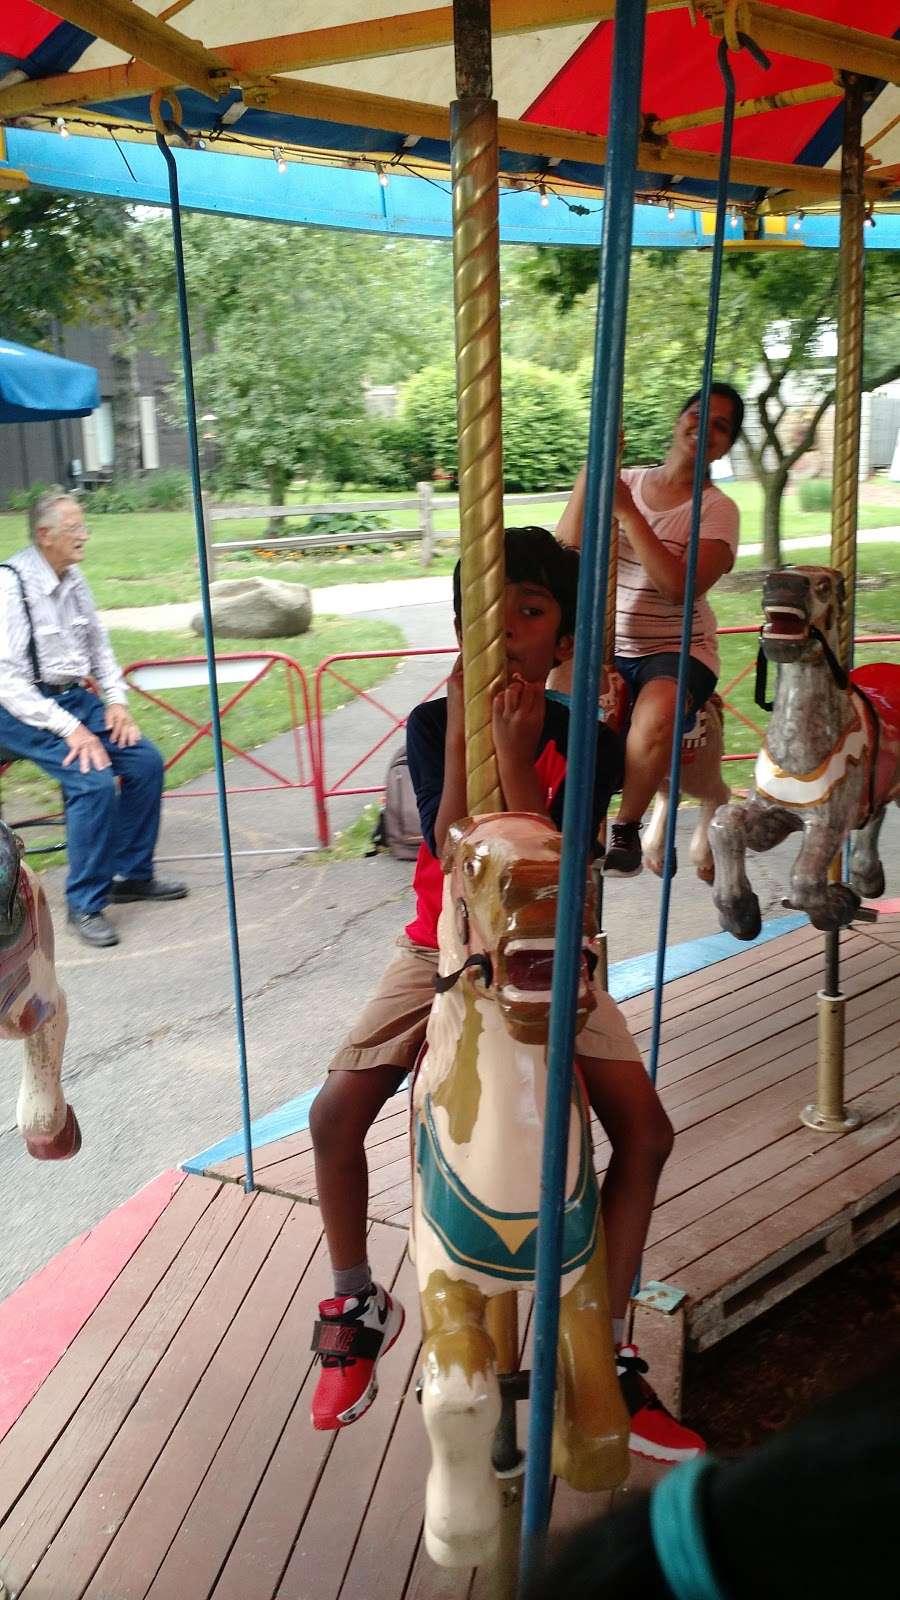 Donleys Wild West Town - amusement park  | Photo 8 of 10 | Address: 8512 S Union Rd, Union, IL 60180, USA | Phone: (815) 923-9000